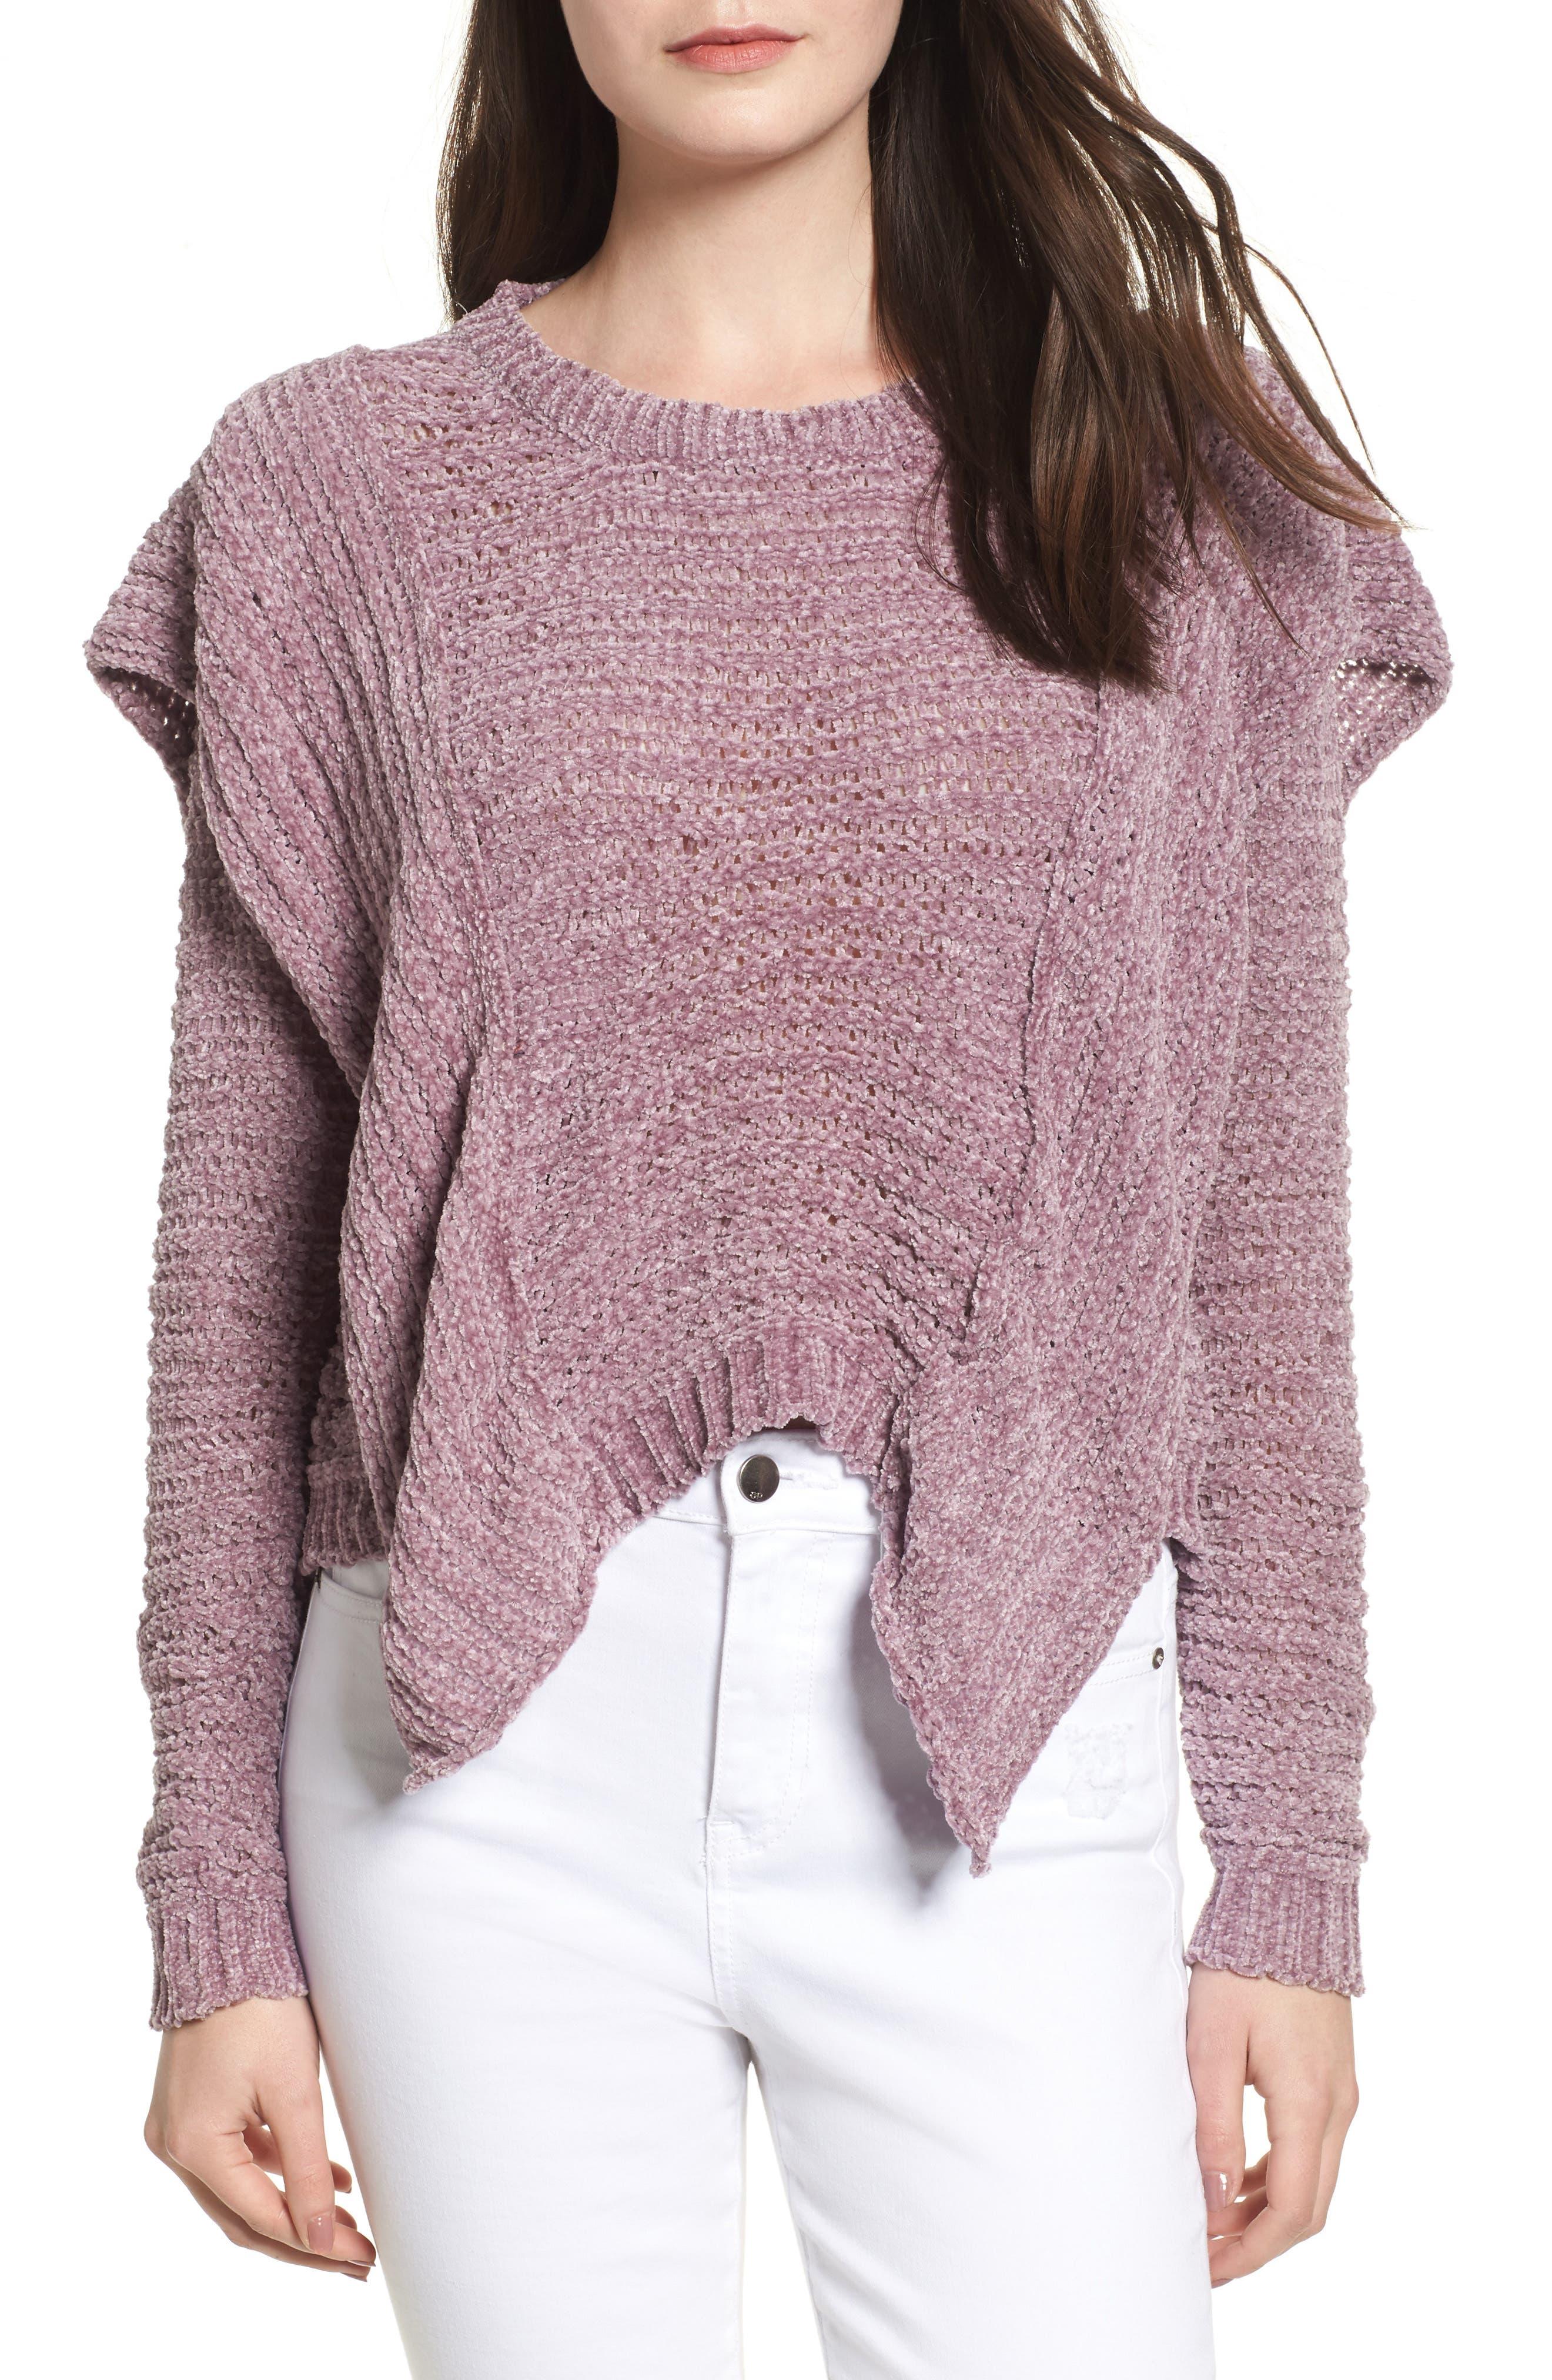 Woven Heart Ruffle Chenille Sweater